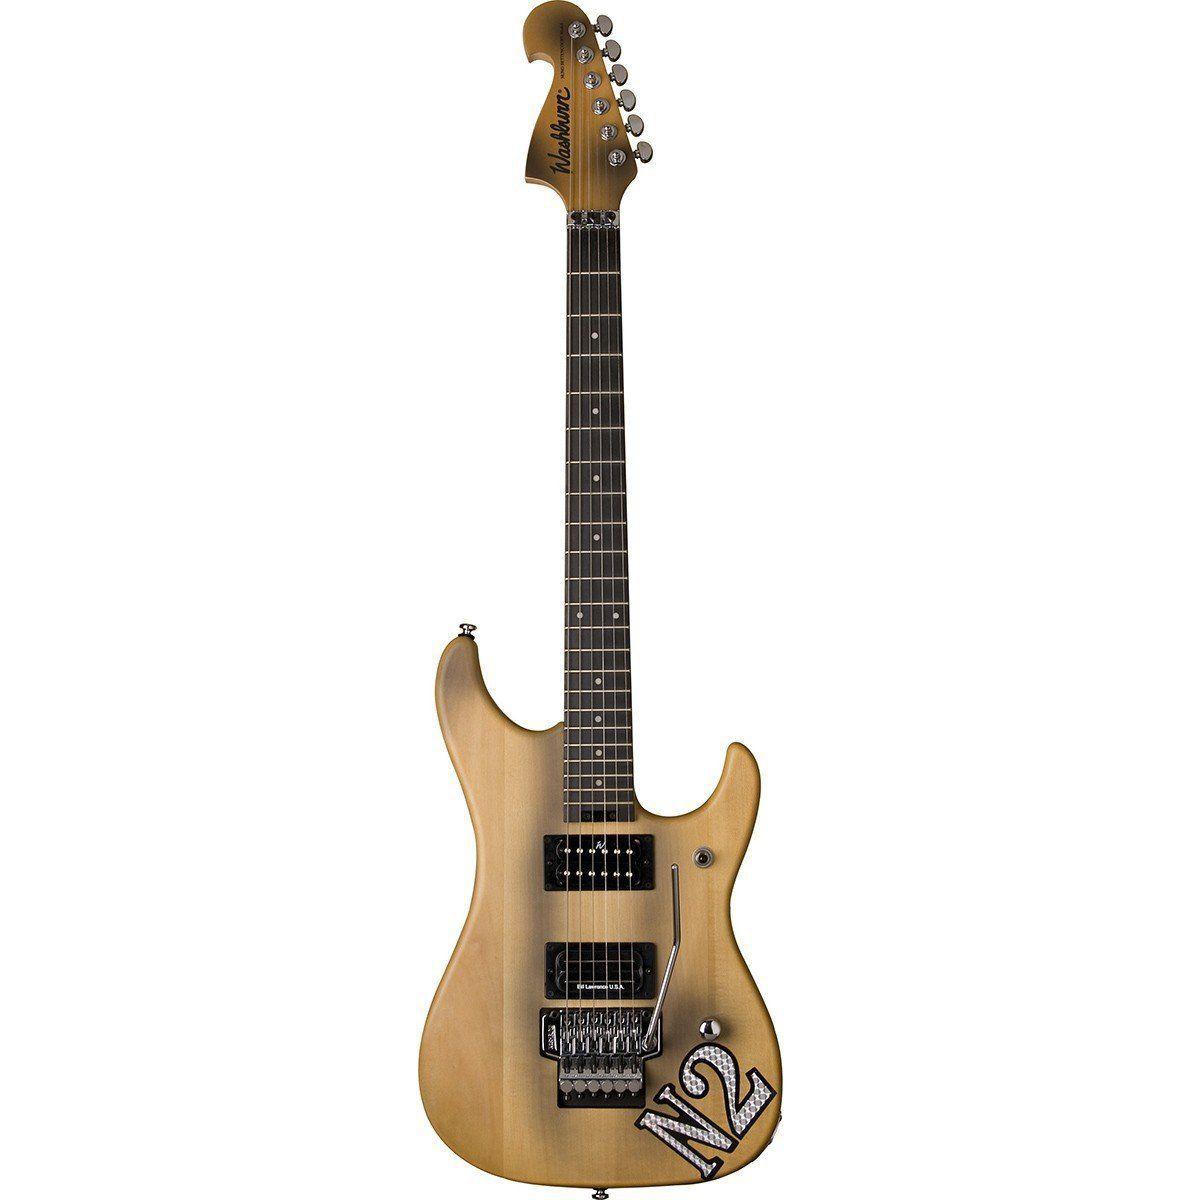 Guitarra Washburn N2 Vintage Nuno Bettencourt Signature Natural  - MegaLojaSP